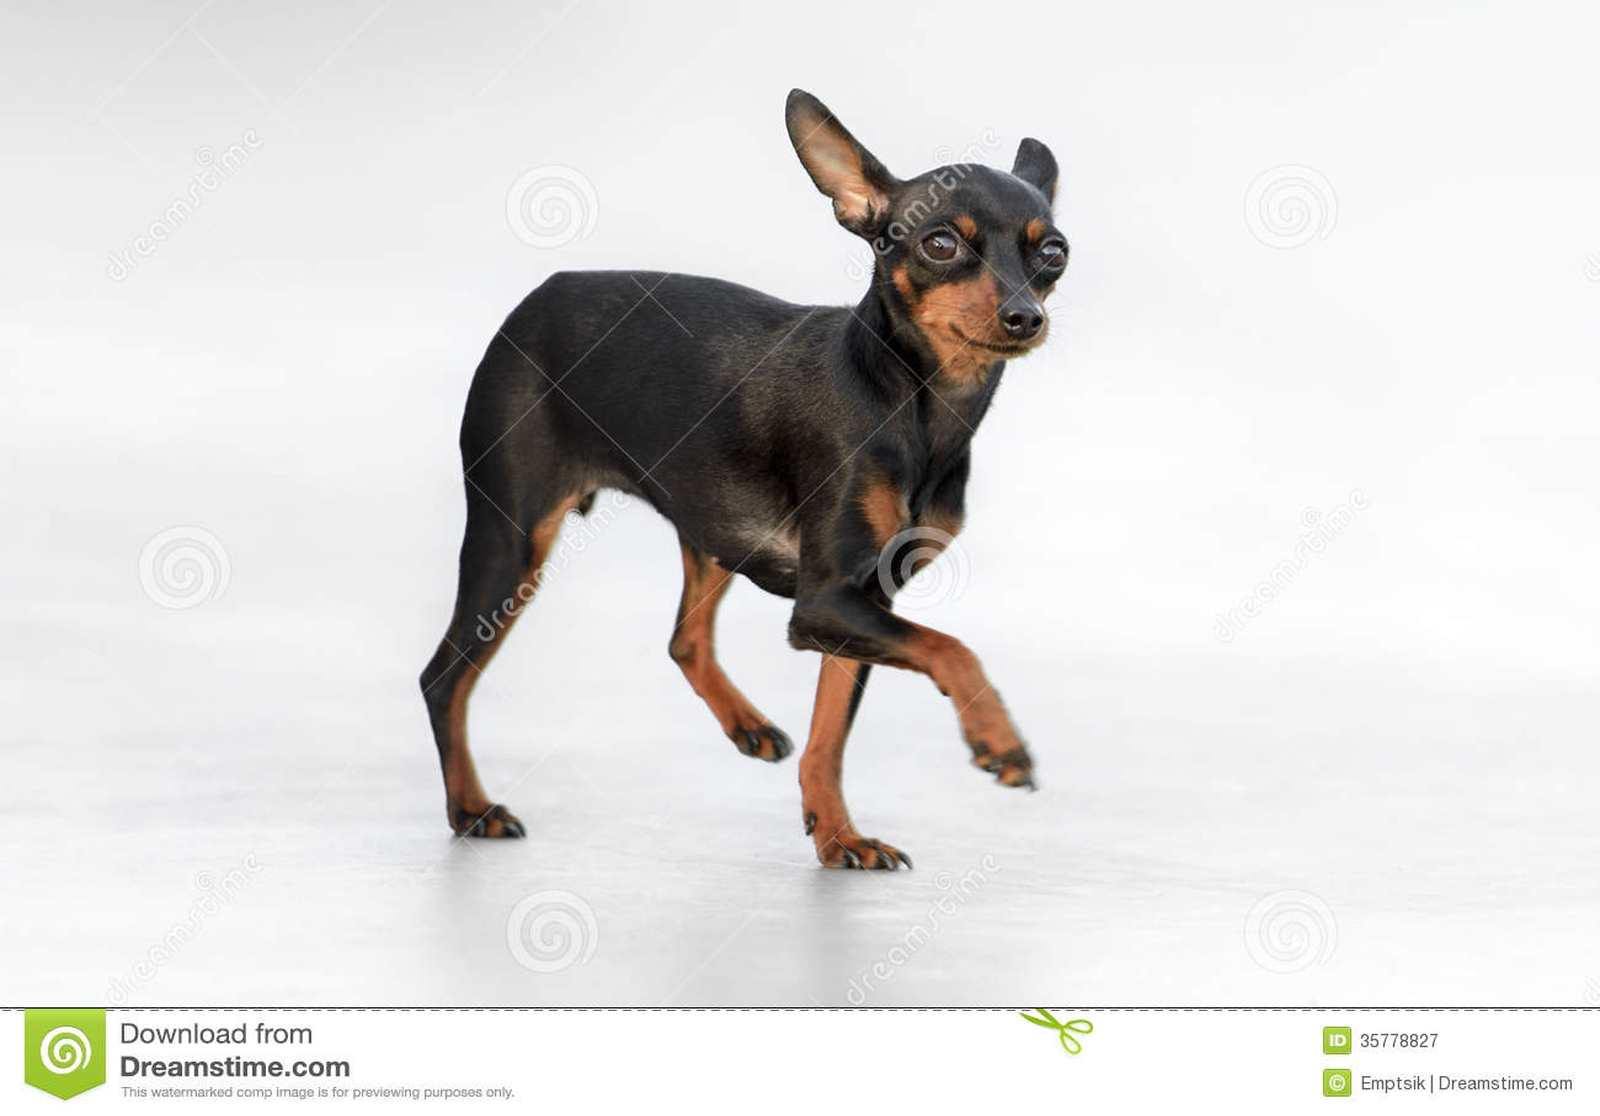 Pincher Maschio Toy Dog Fotografia Stock Libera da Diritti - Immagine ...